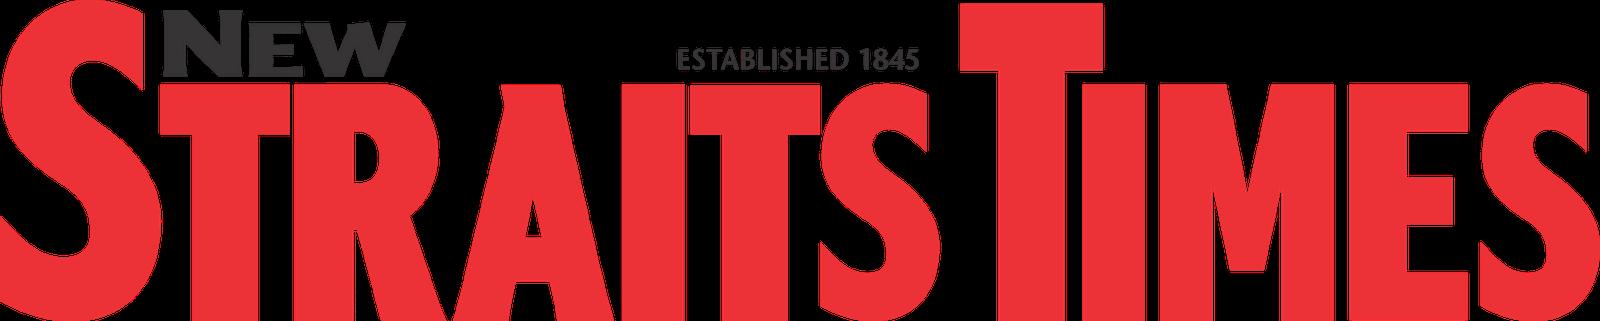 New Straits Times | The New Straits Times Press (Malaysia) Bhd